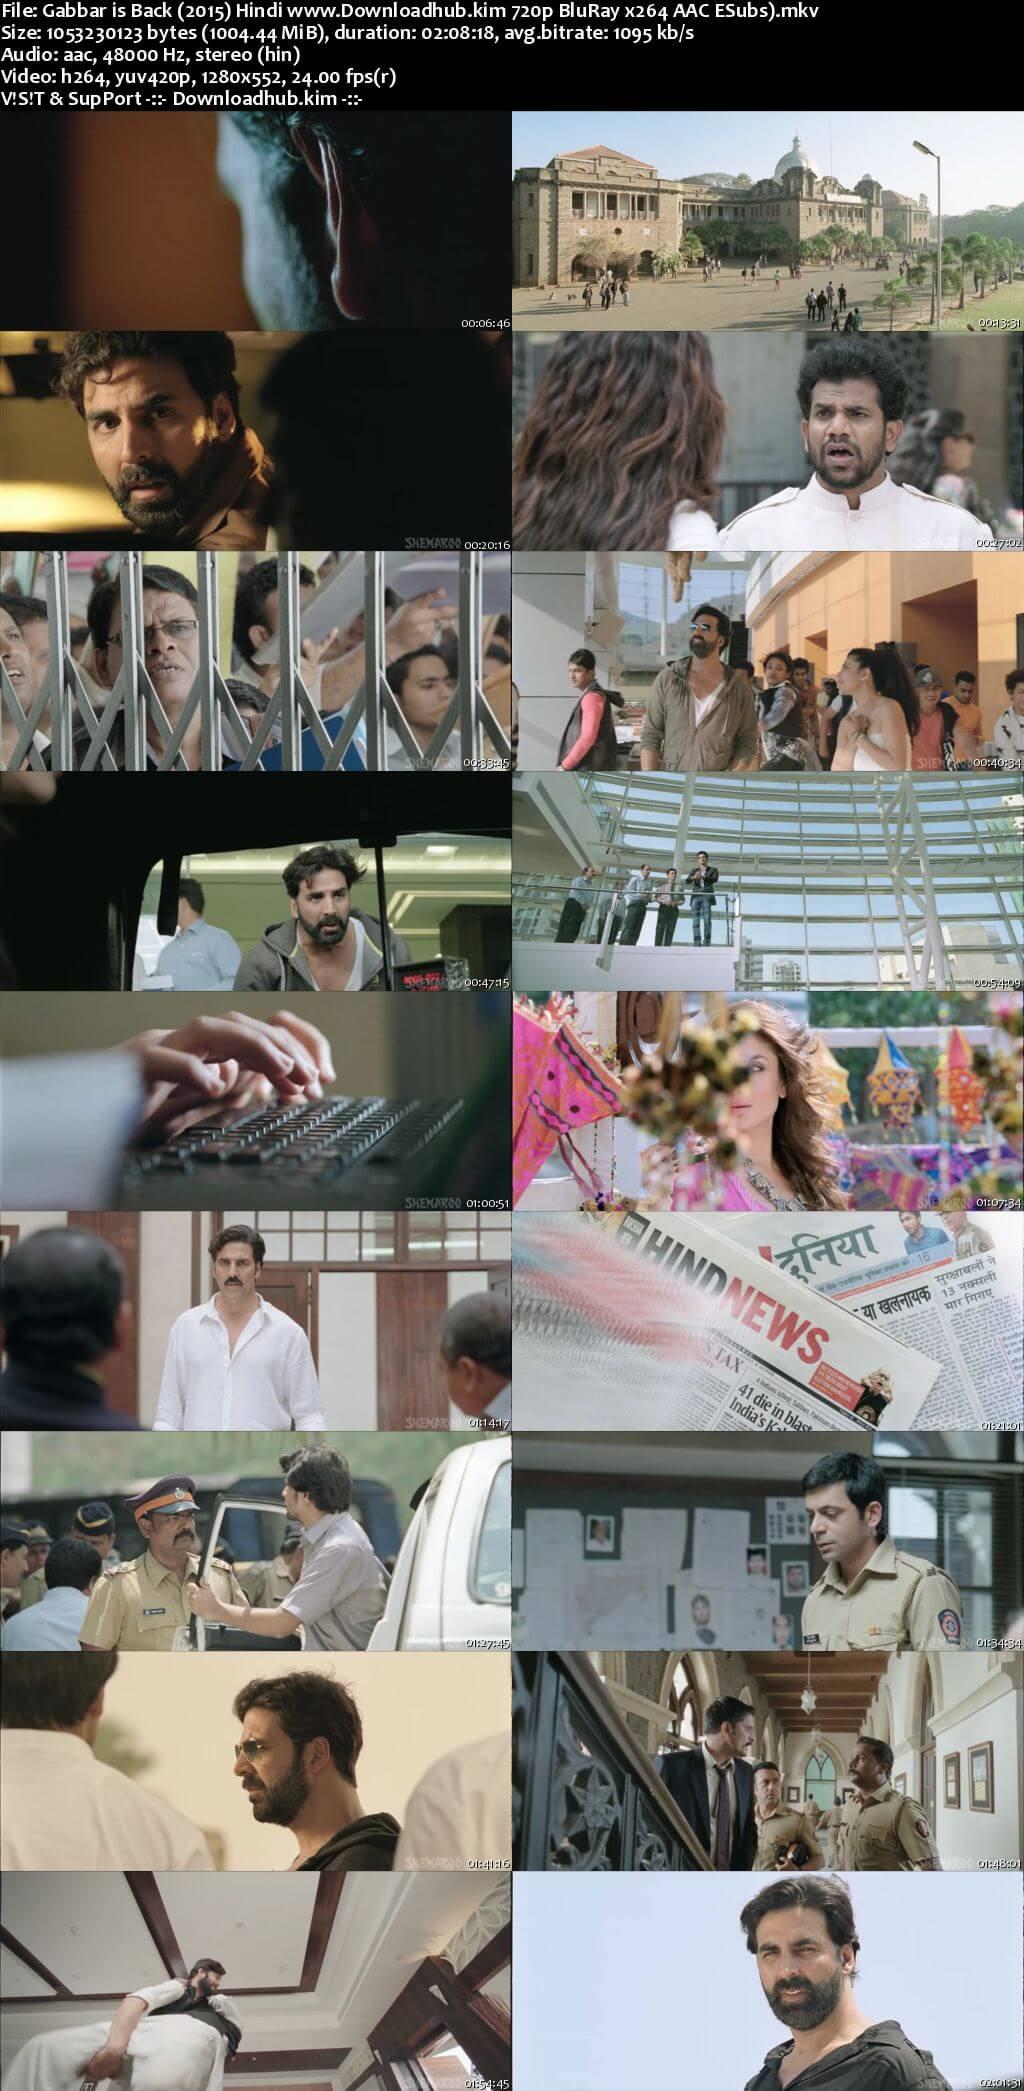 Gabbar Is Back 2015 Hindi 720p BluRay ESubs